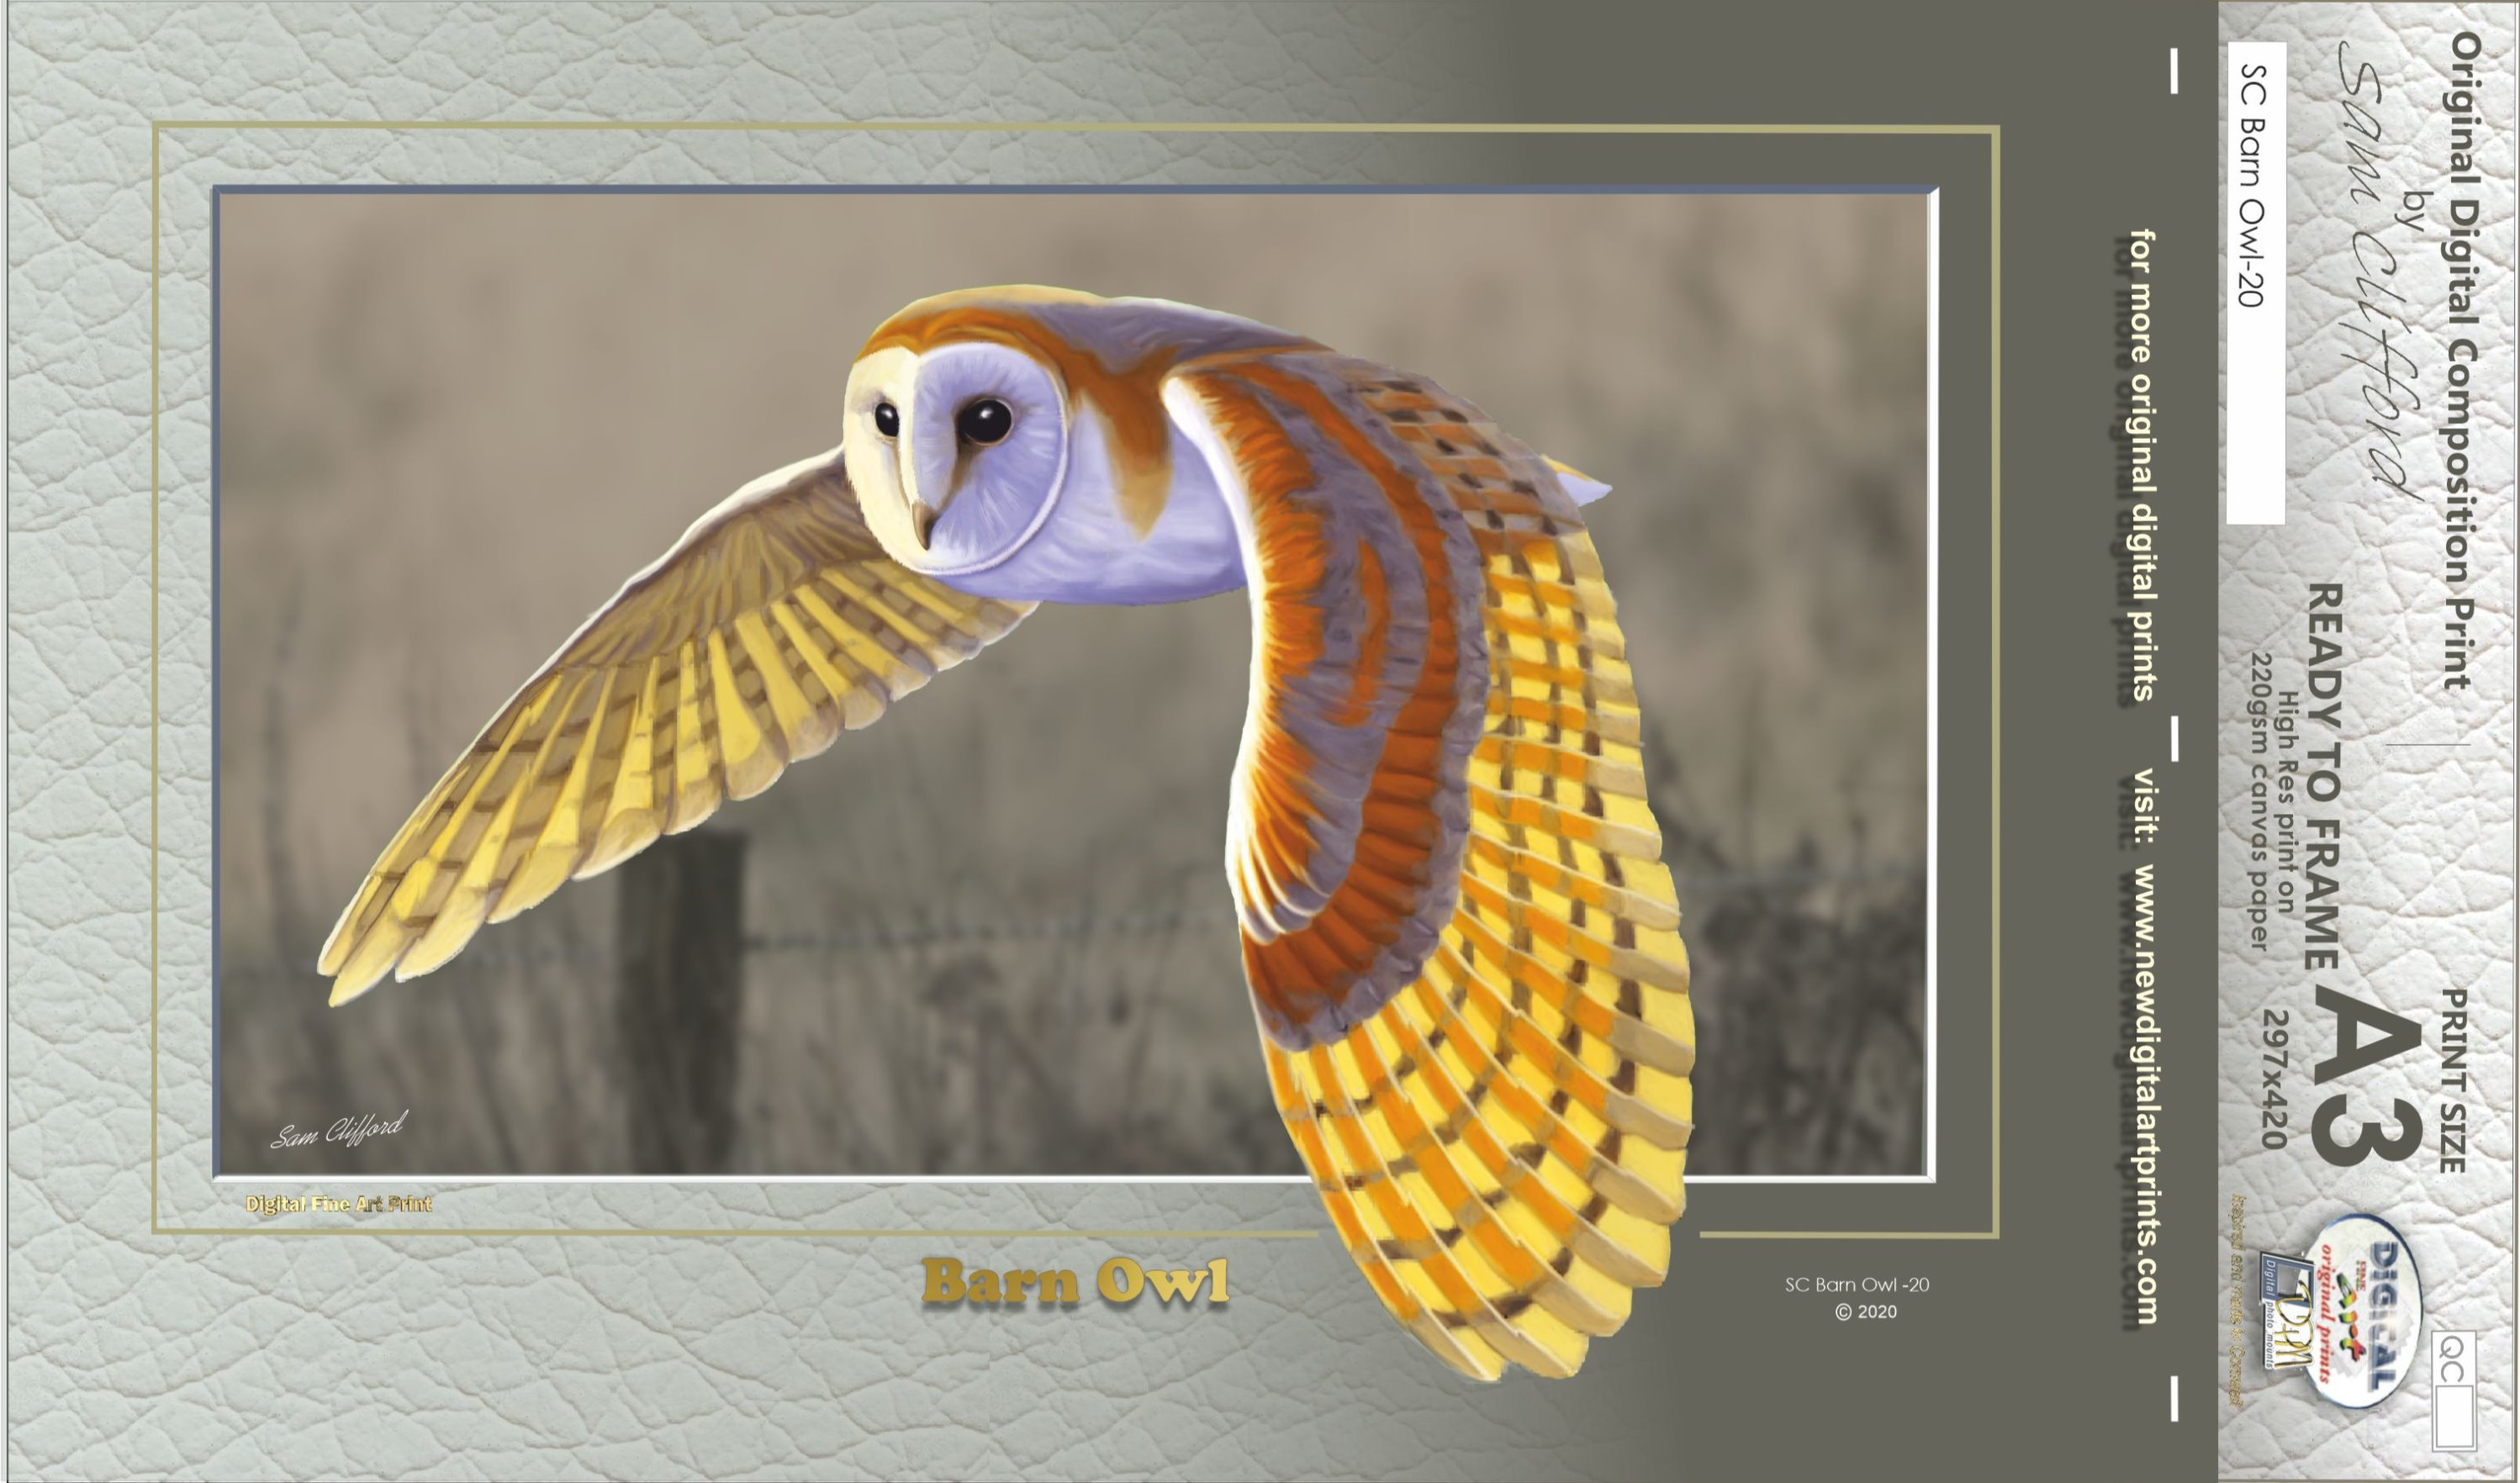 SC - Barn Owl-20